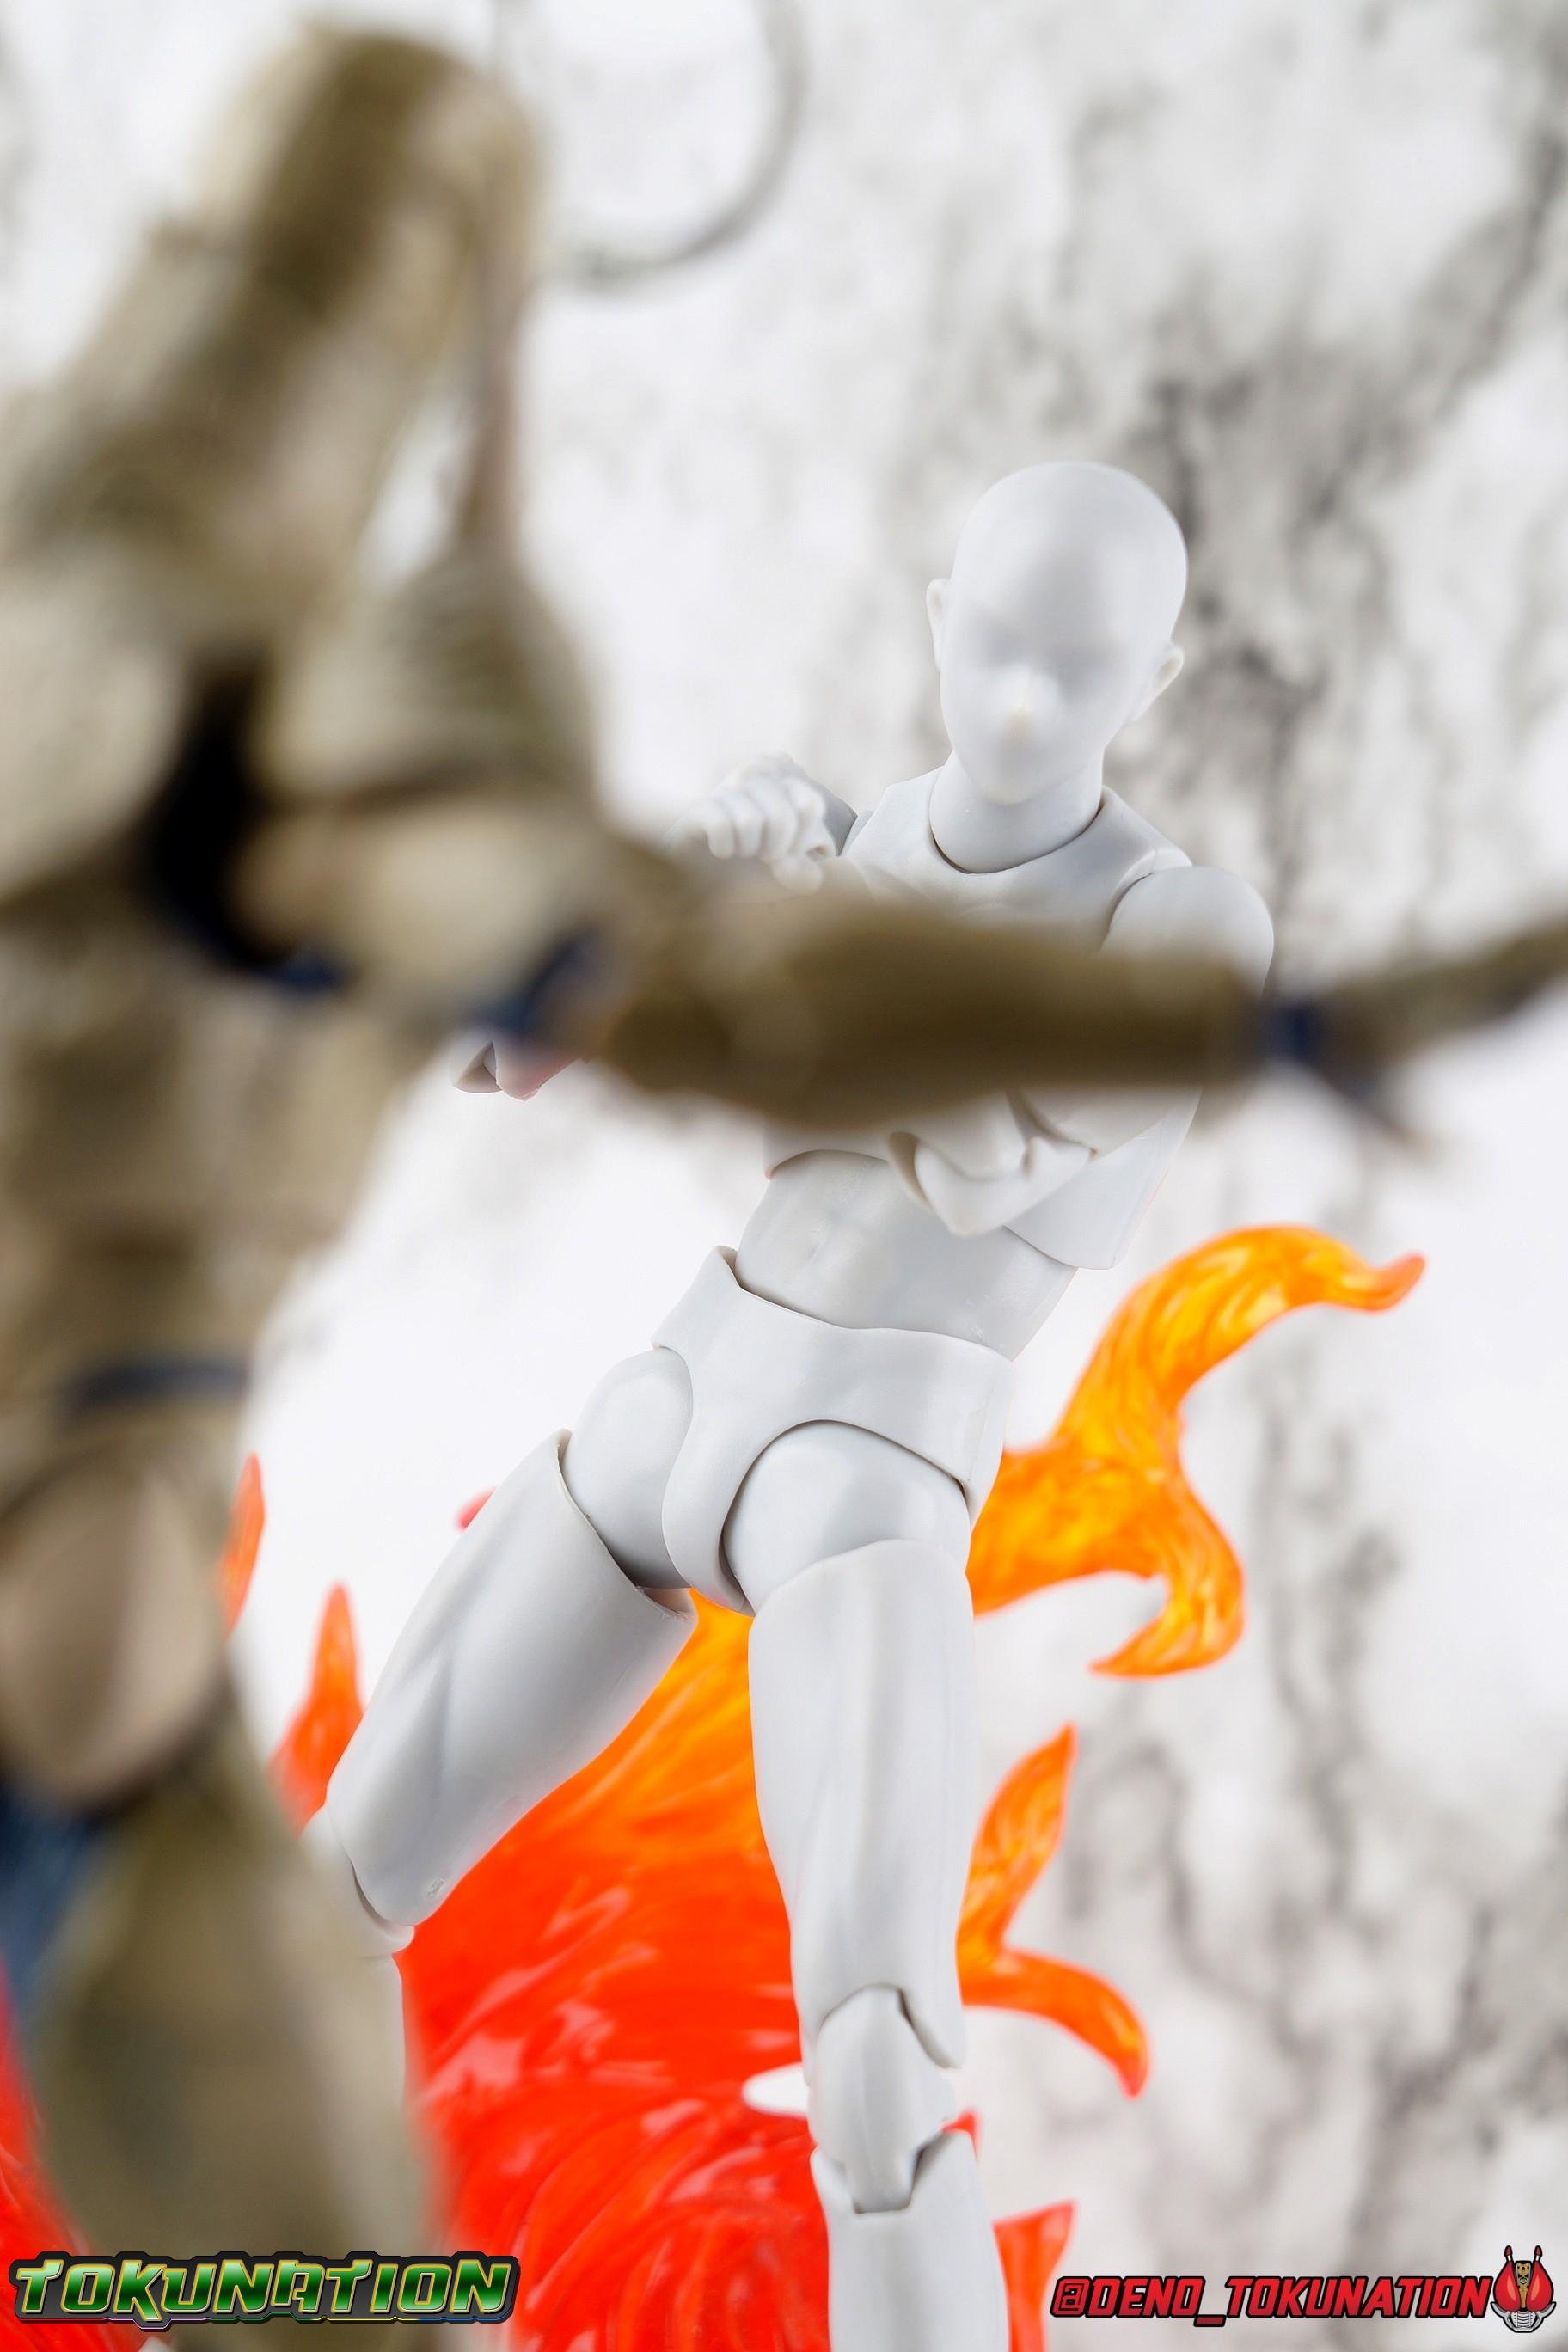 Figuarts Kamen Rider shinkocchou Kuuga Mighty form DECADE V figure JAPAN S.H